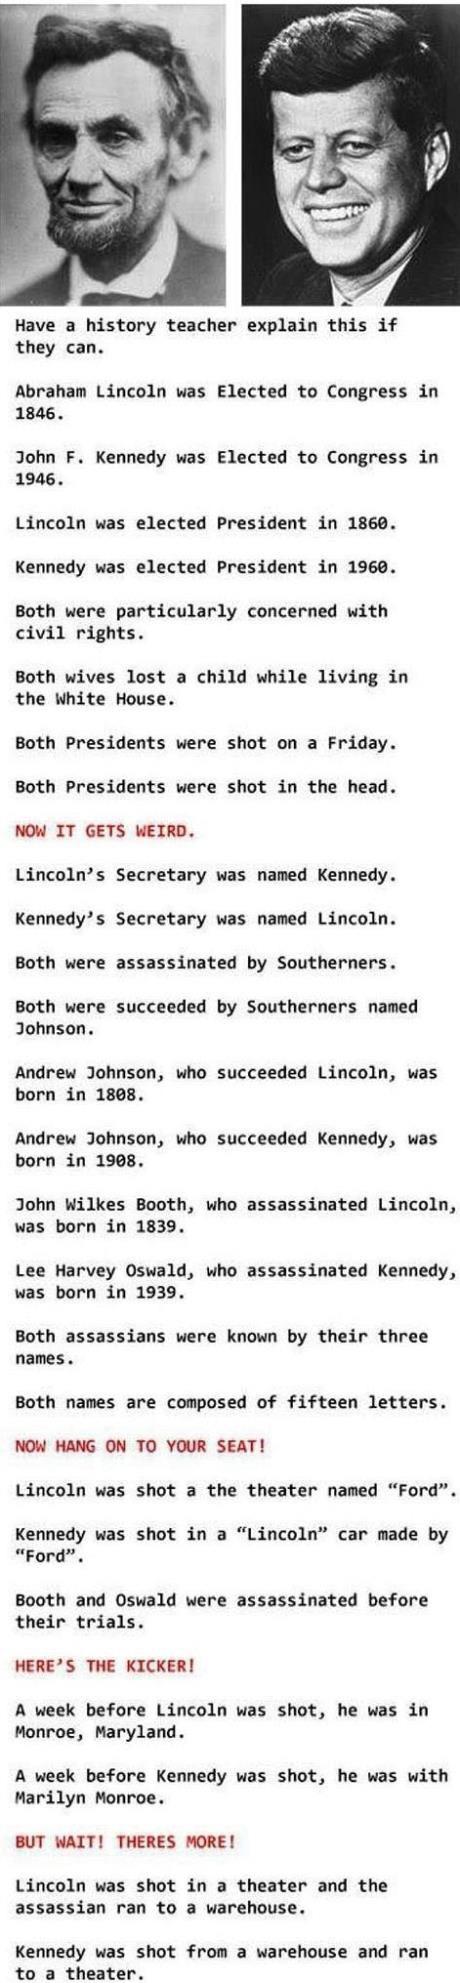 Coincidence https://t.co/A2KMQTNUmk